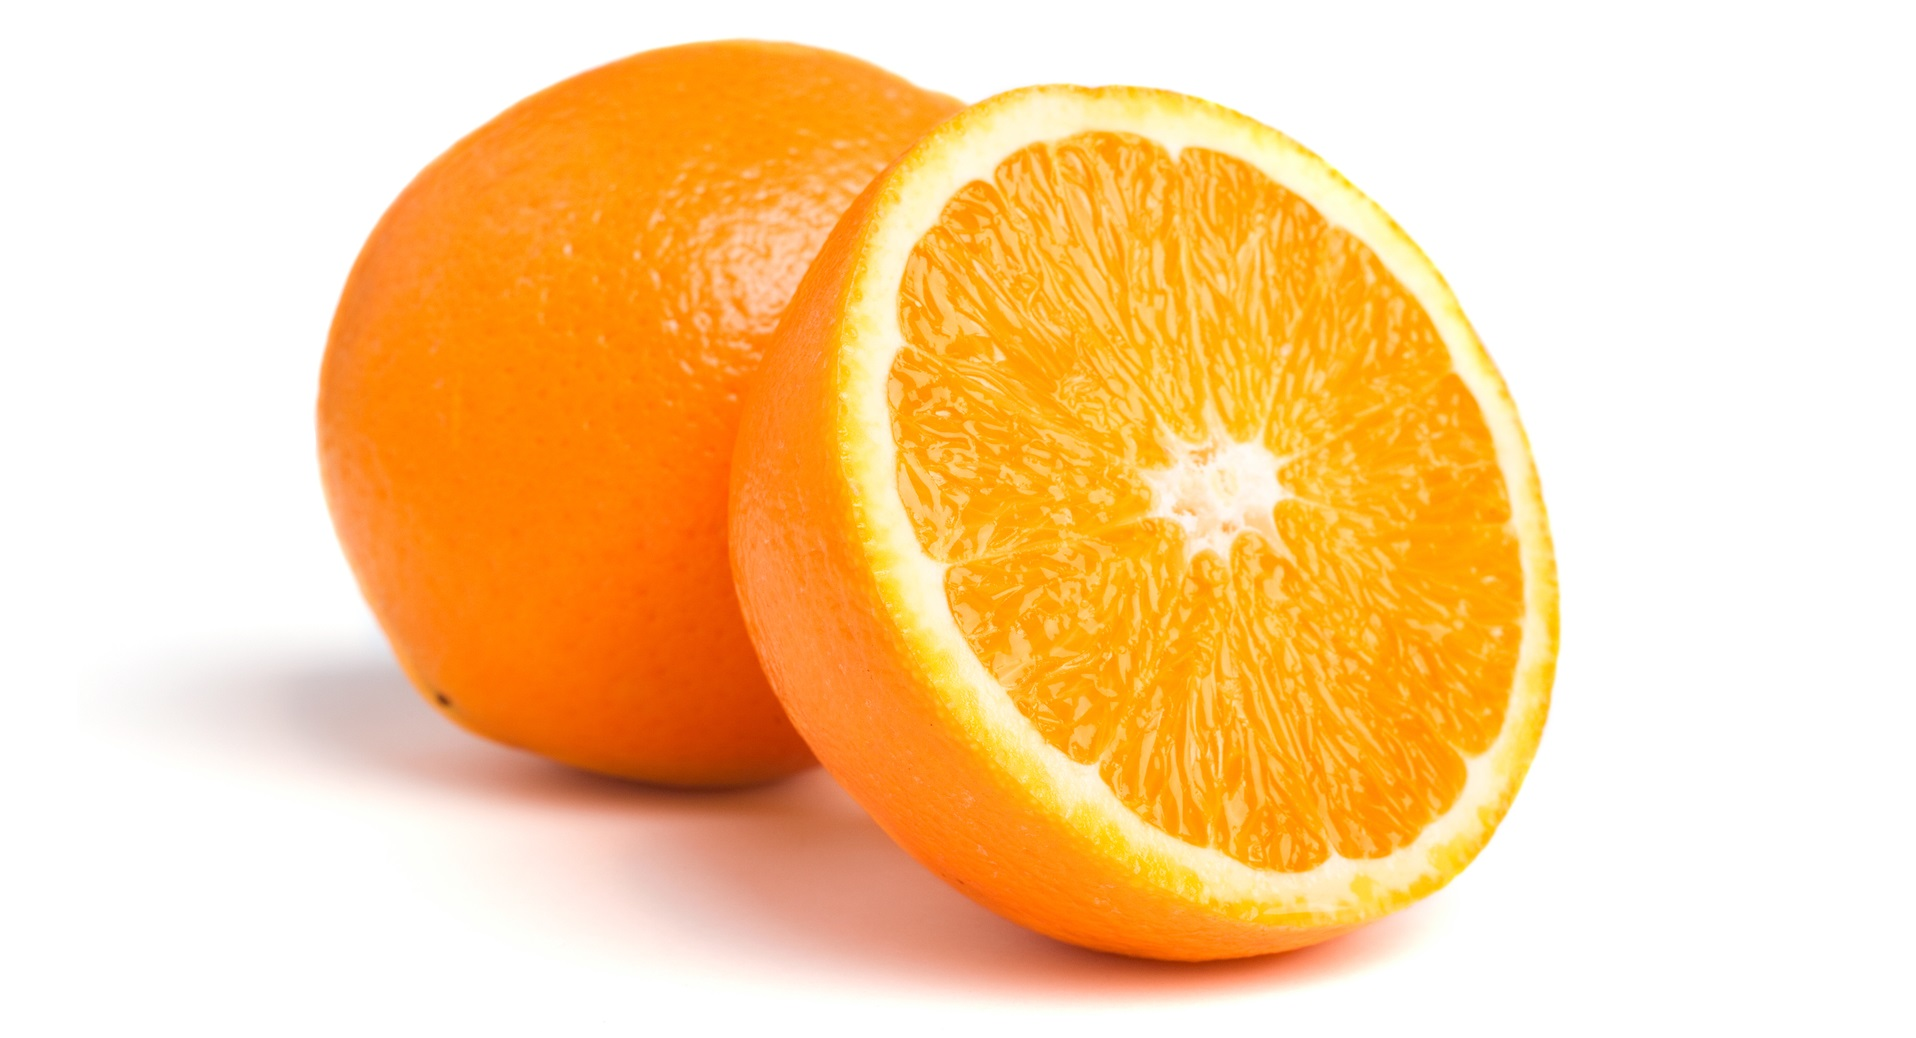 One and half oranges